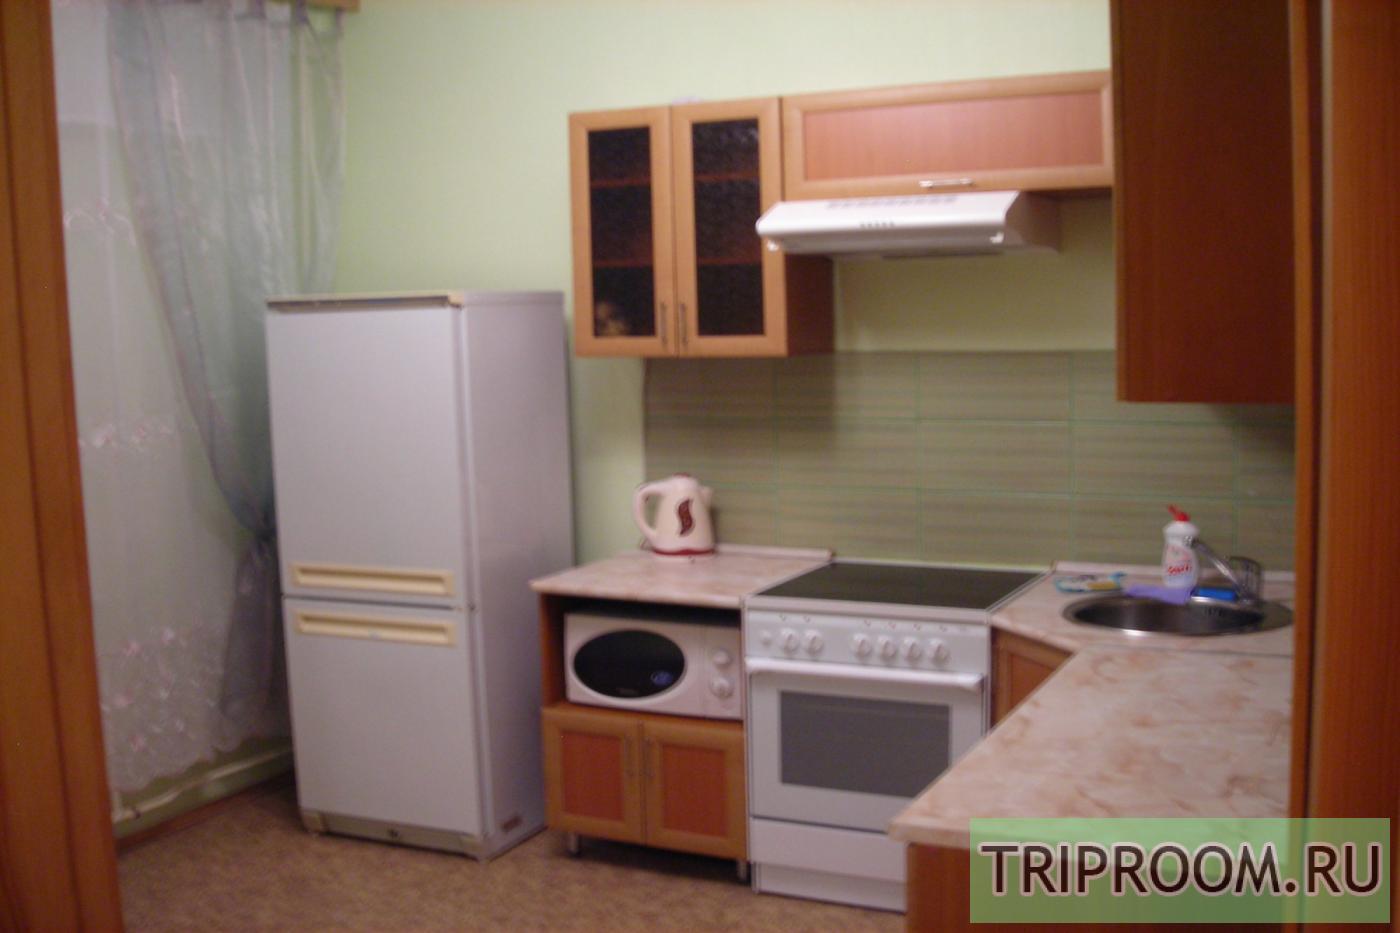 1-комнатная квартира посуточно (вариант № 18159), ул. Московский проспект, фото № 1